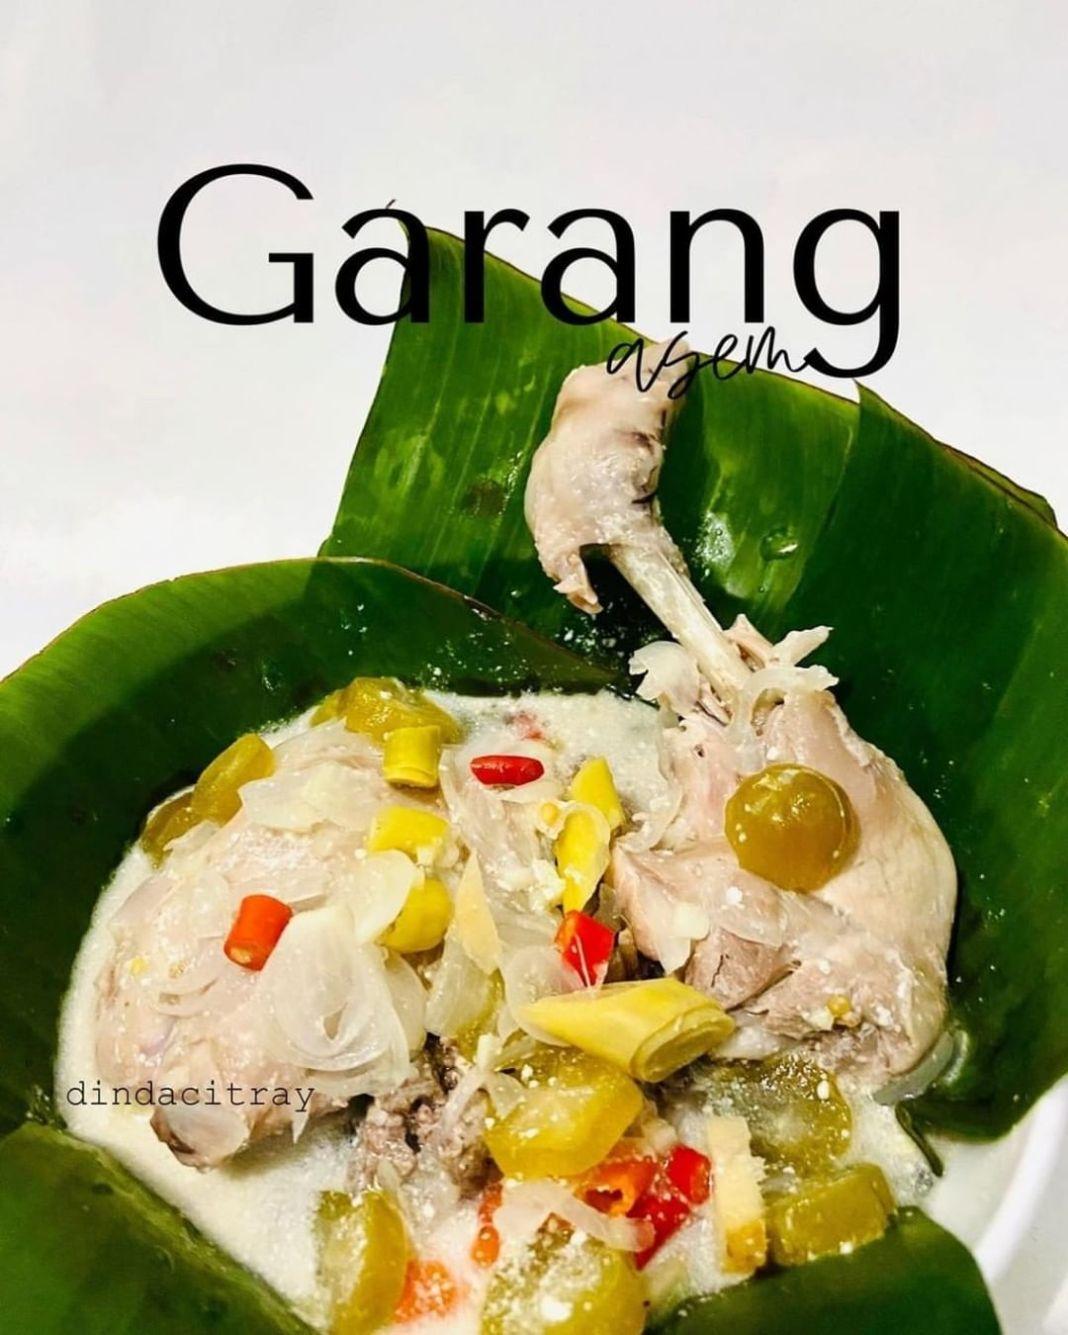 Info kuliner, we hope everyone is a having a great holiday weekend. Kali ini Garang asem yang udah cemplungin…